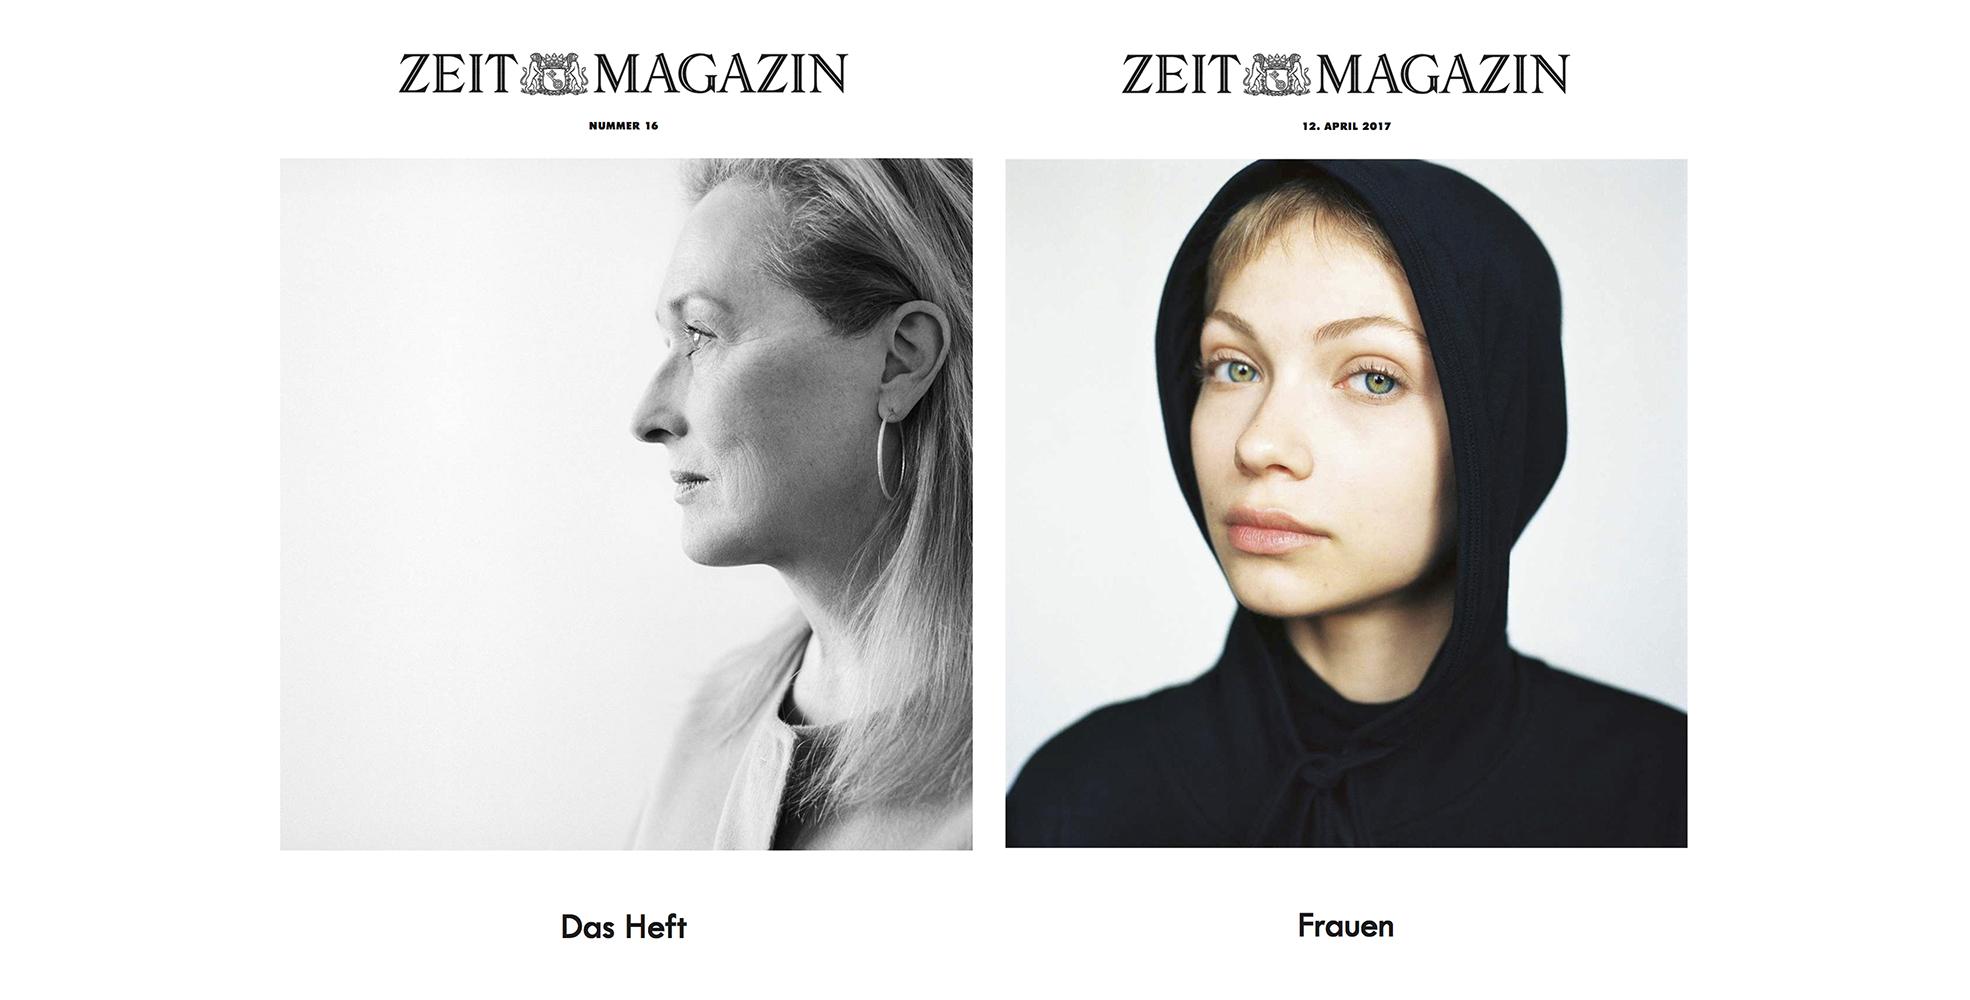 The Female Lead_ZeitMagazine_Cover.JPG